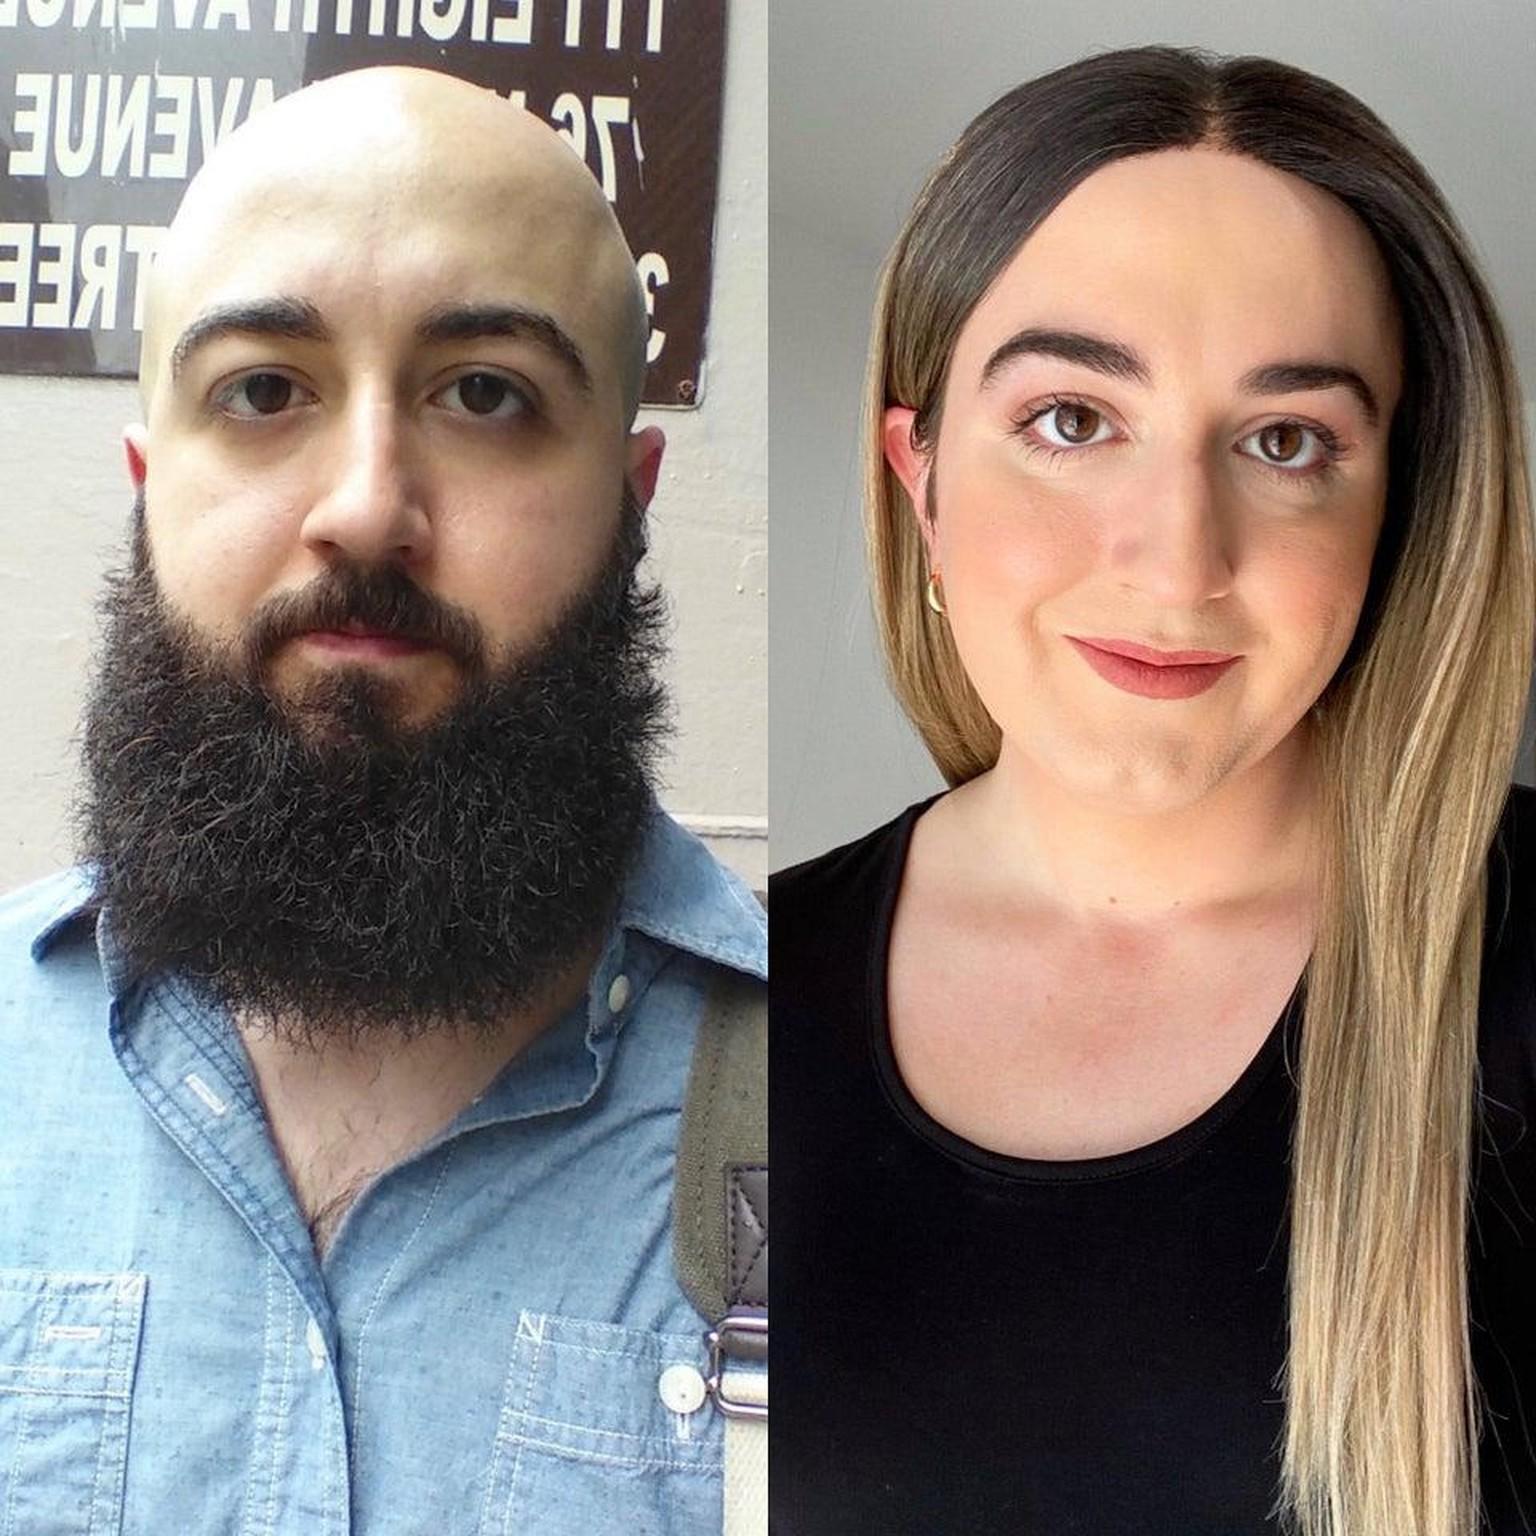 Nachher frau vorher mann zu Geschlechtsumwandlung frau